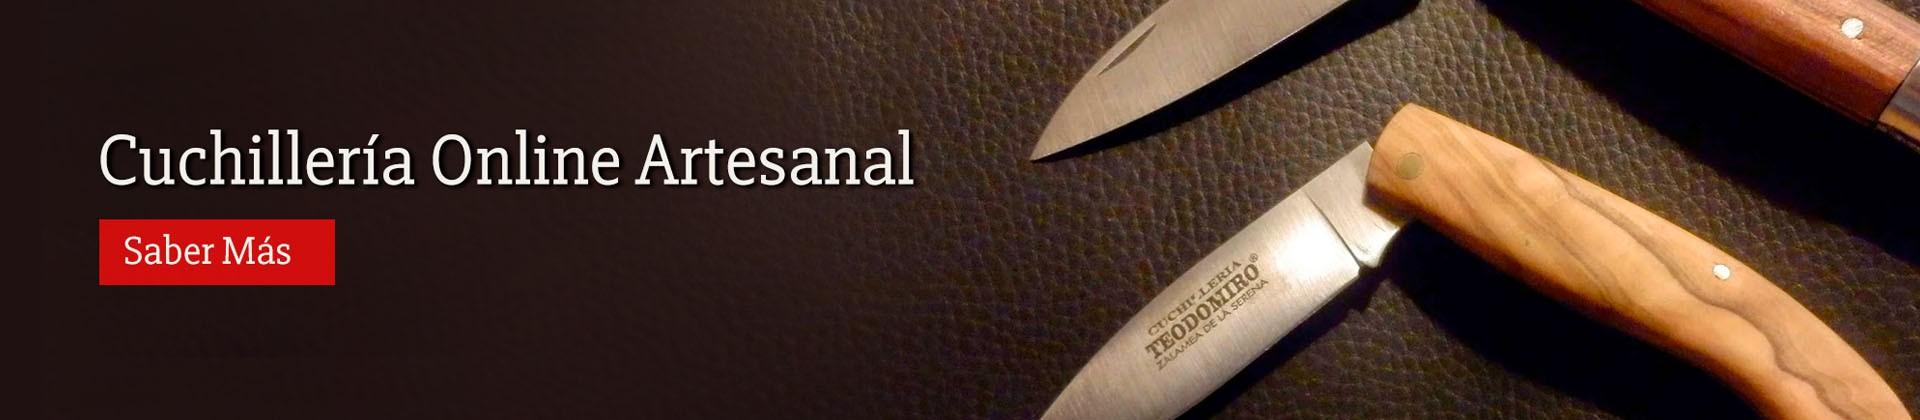 Cuchillería Online Artesanal